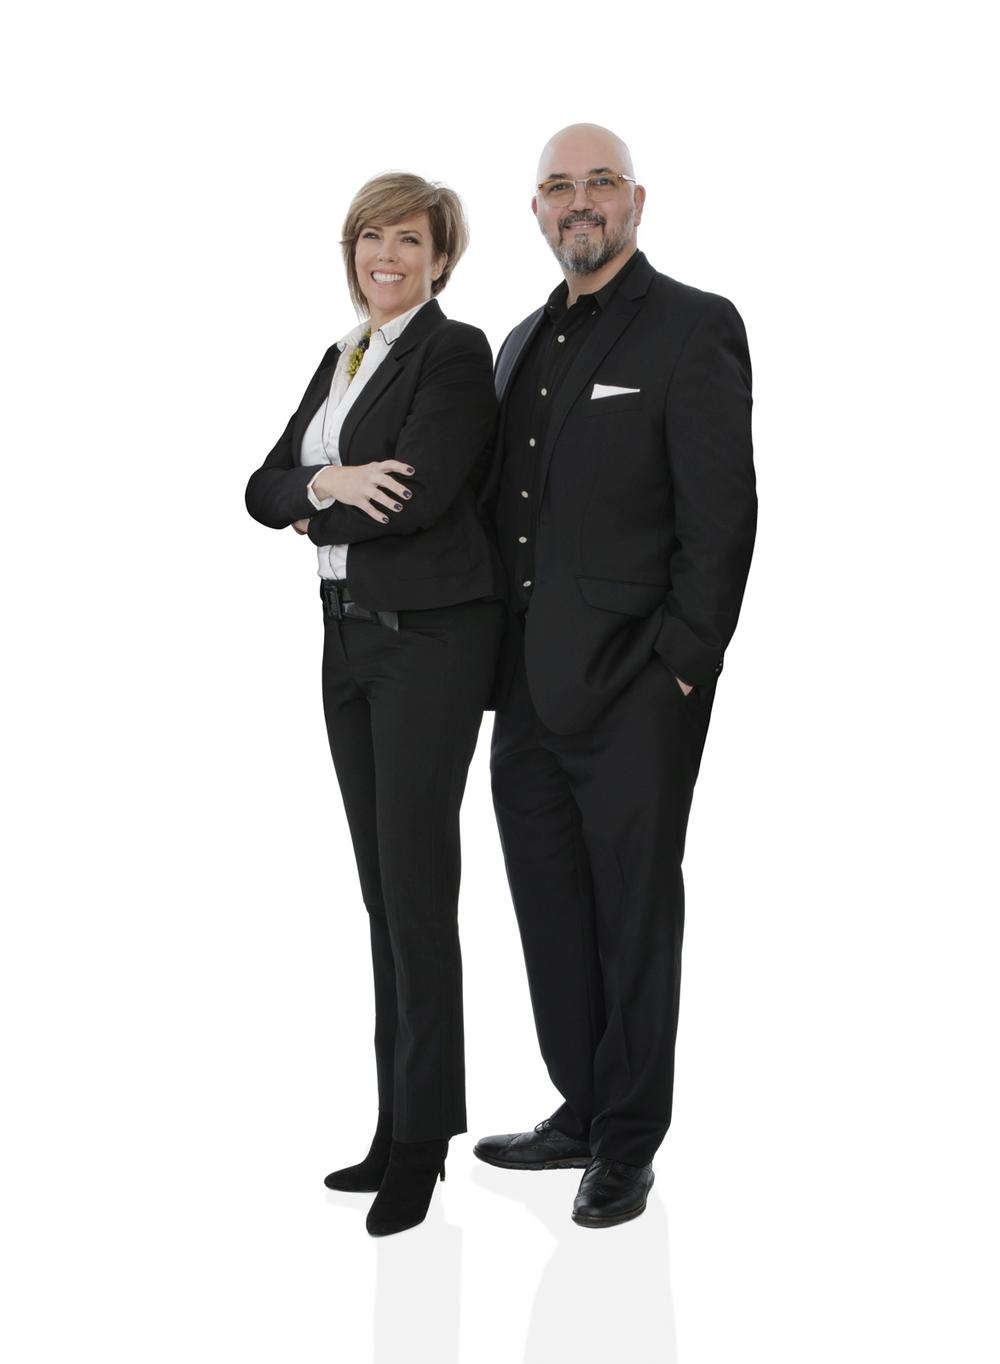 Mechelle and Matthew Khodayari, owners of Aria Salon Spa Shoppes in Alpharetta and Cumming, Georgia.